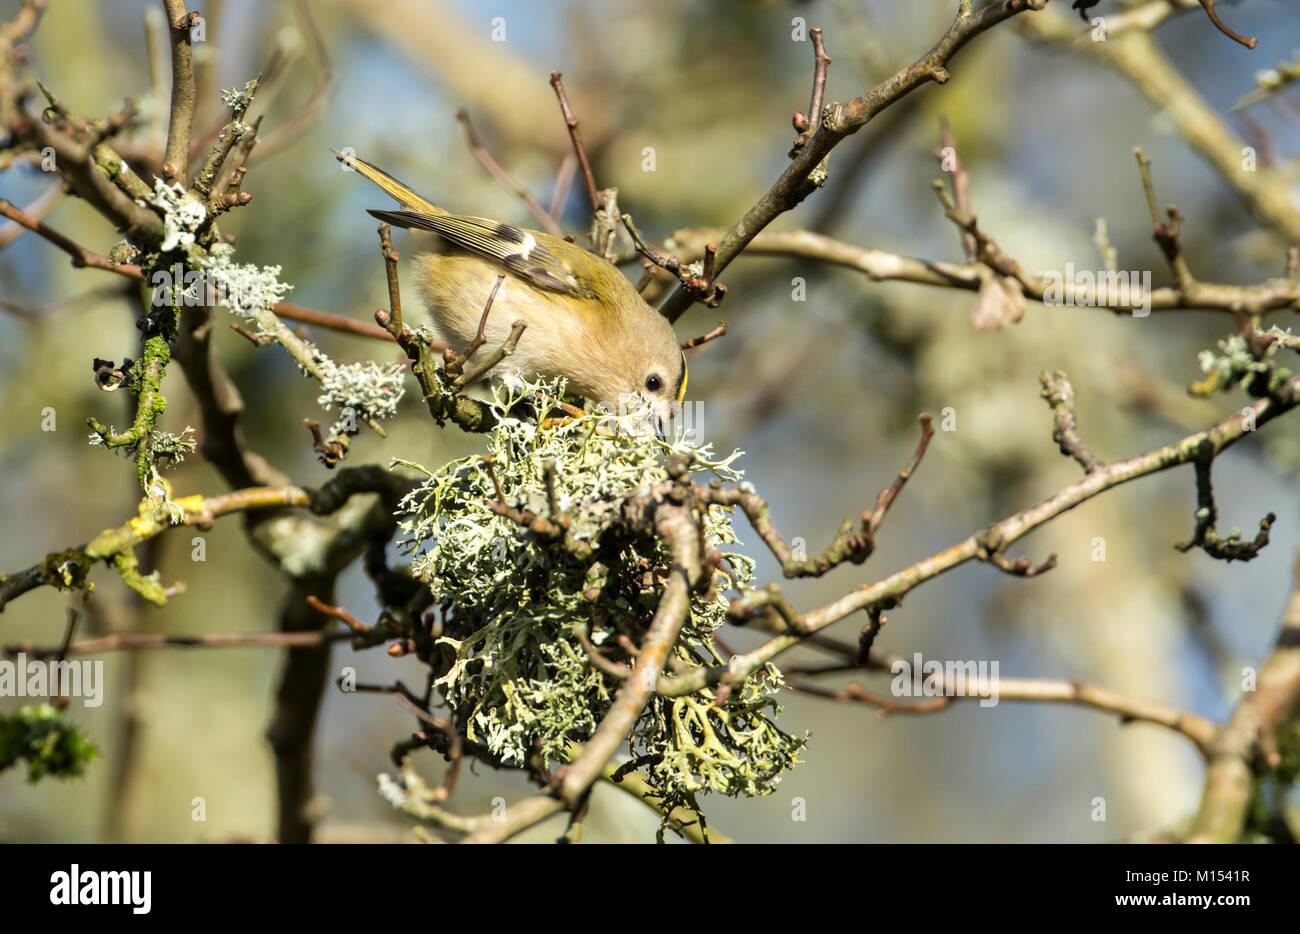 Goldcrest (Regulus regulus) foraging for invertebrates in a lichen-encrusted tree. - Stock Image